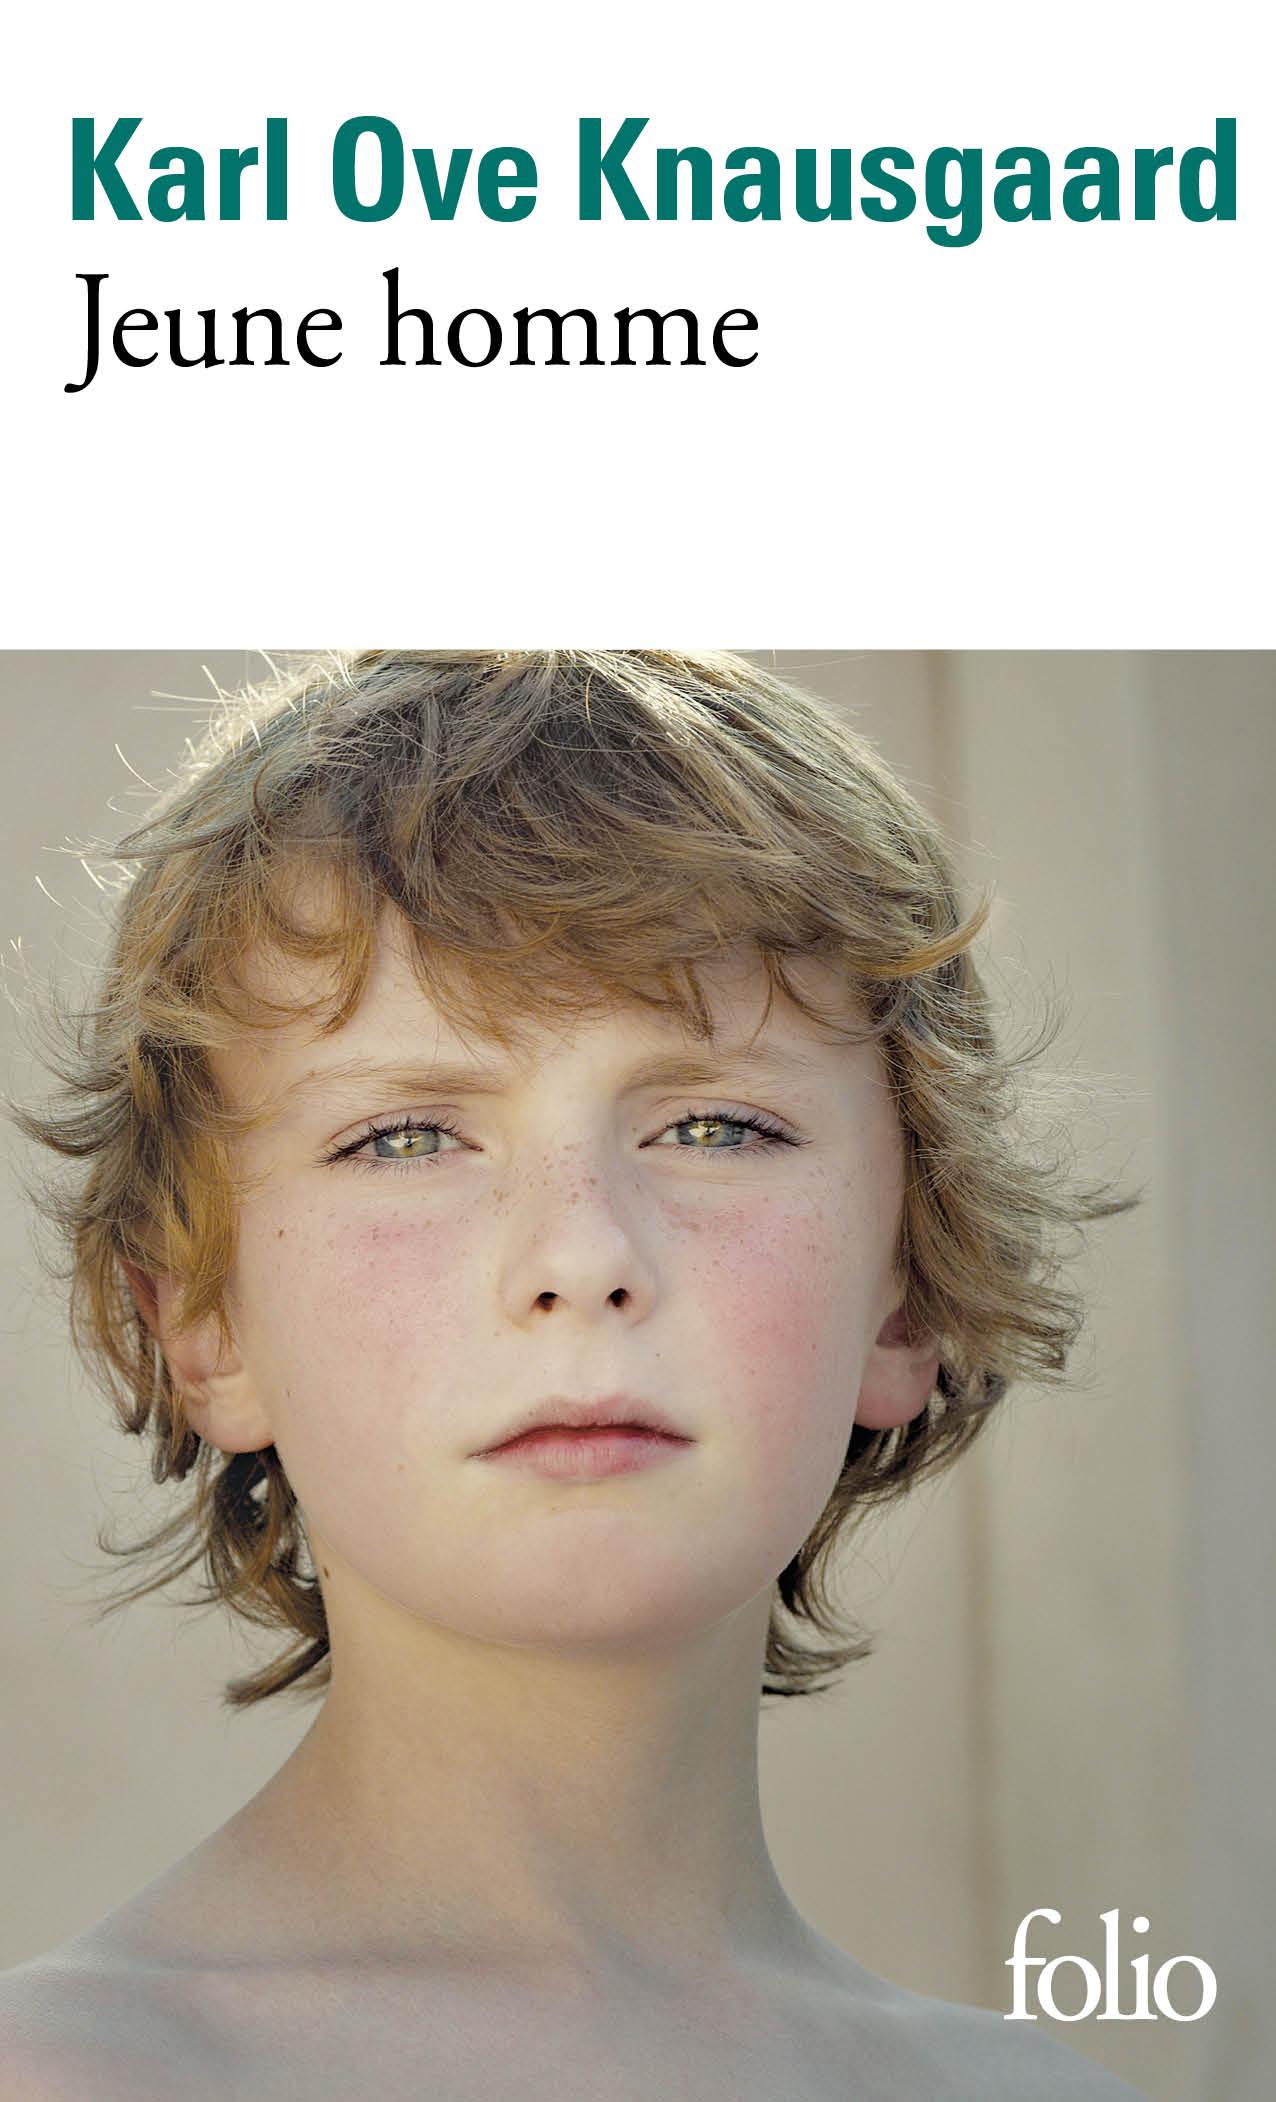 Mon combat (Tome 3) - Jeune homme | Knausgaard, Karl Ove